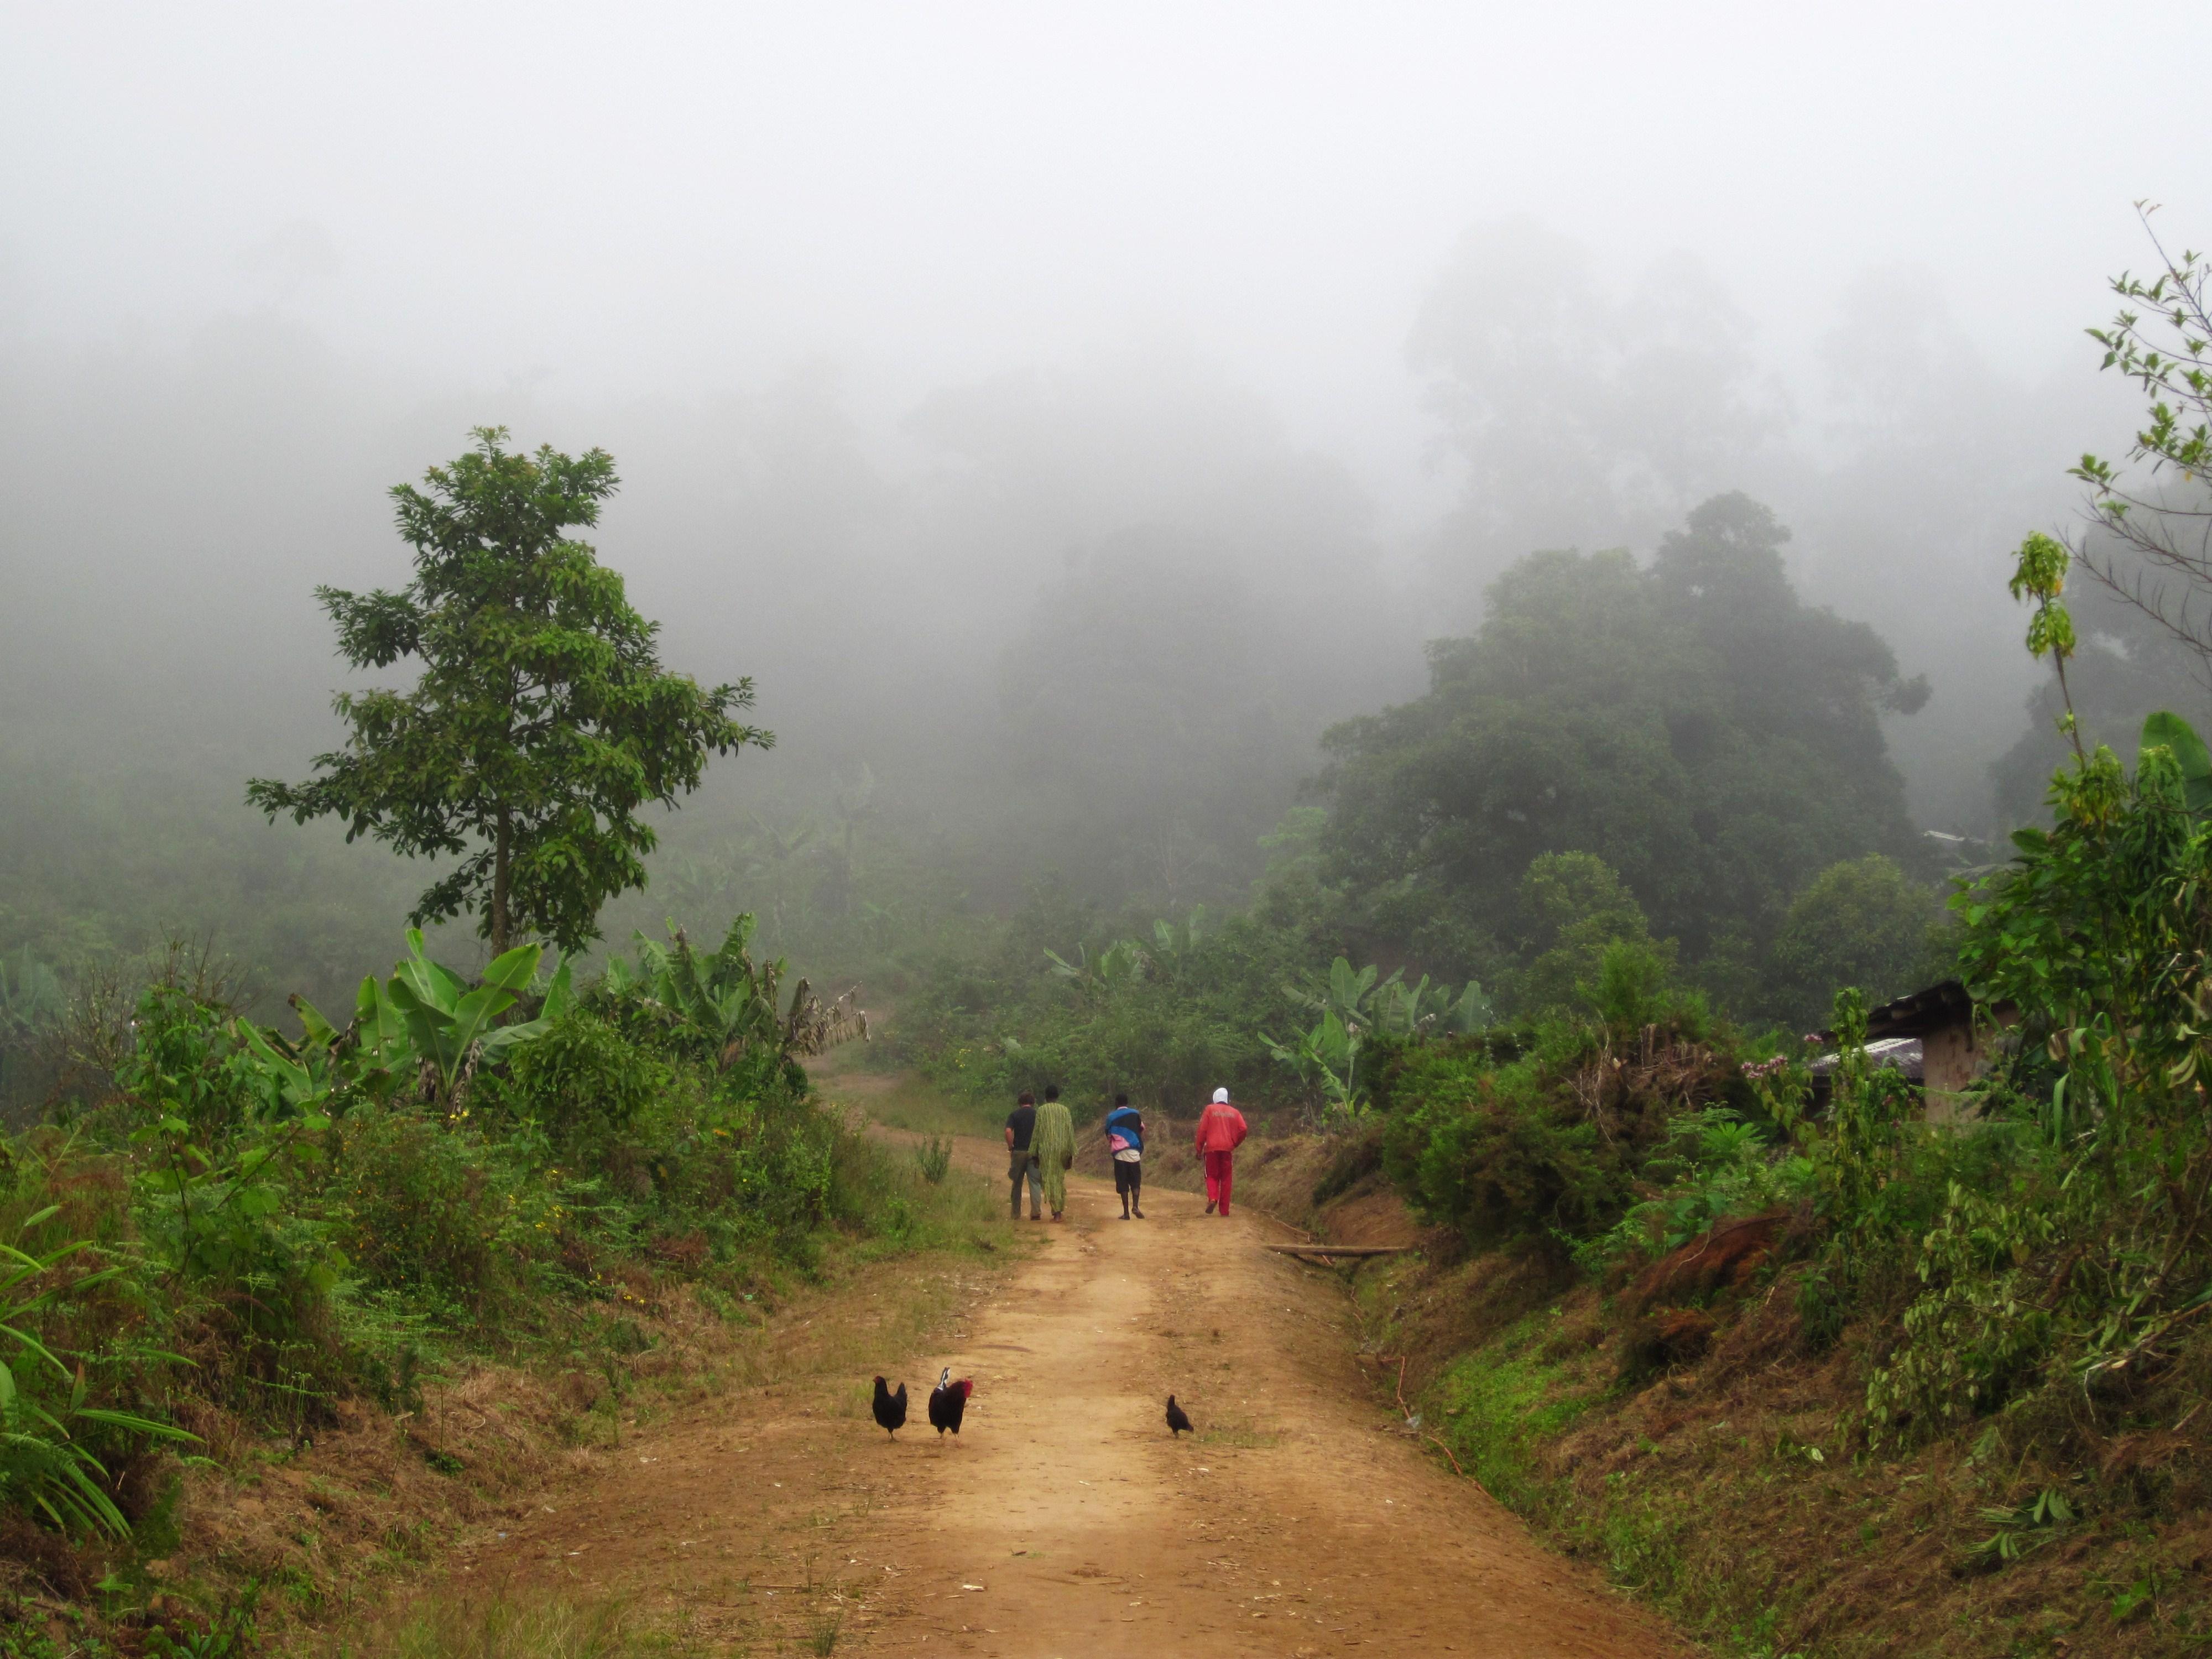 Hilltop Villagers, Cameroon